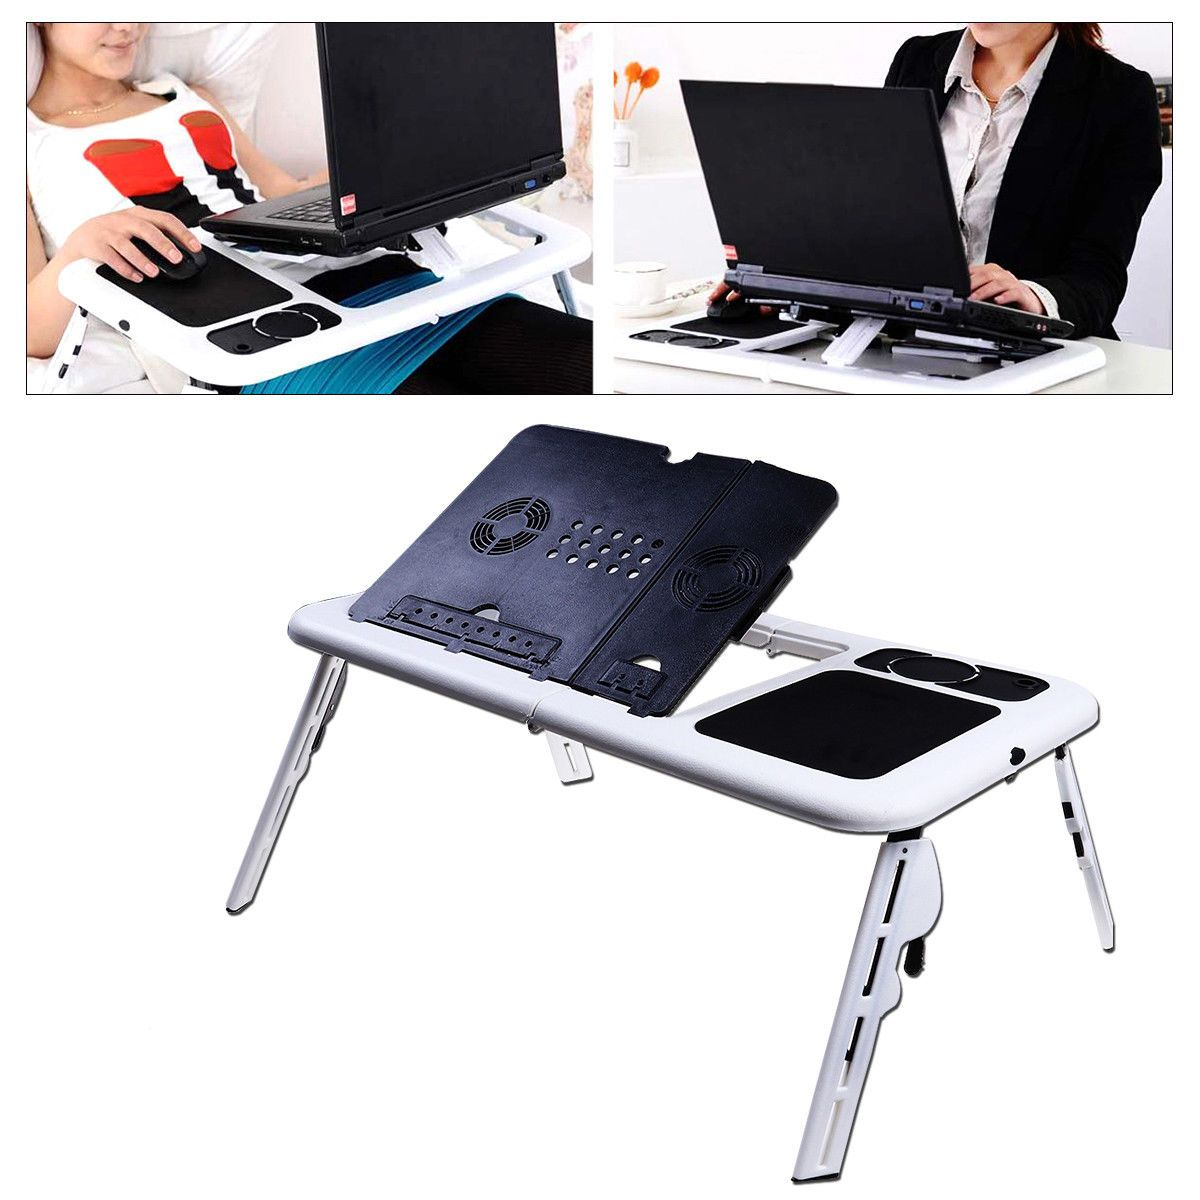 Foldable Adjustable Laptop Desk Table Stand Notebook For